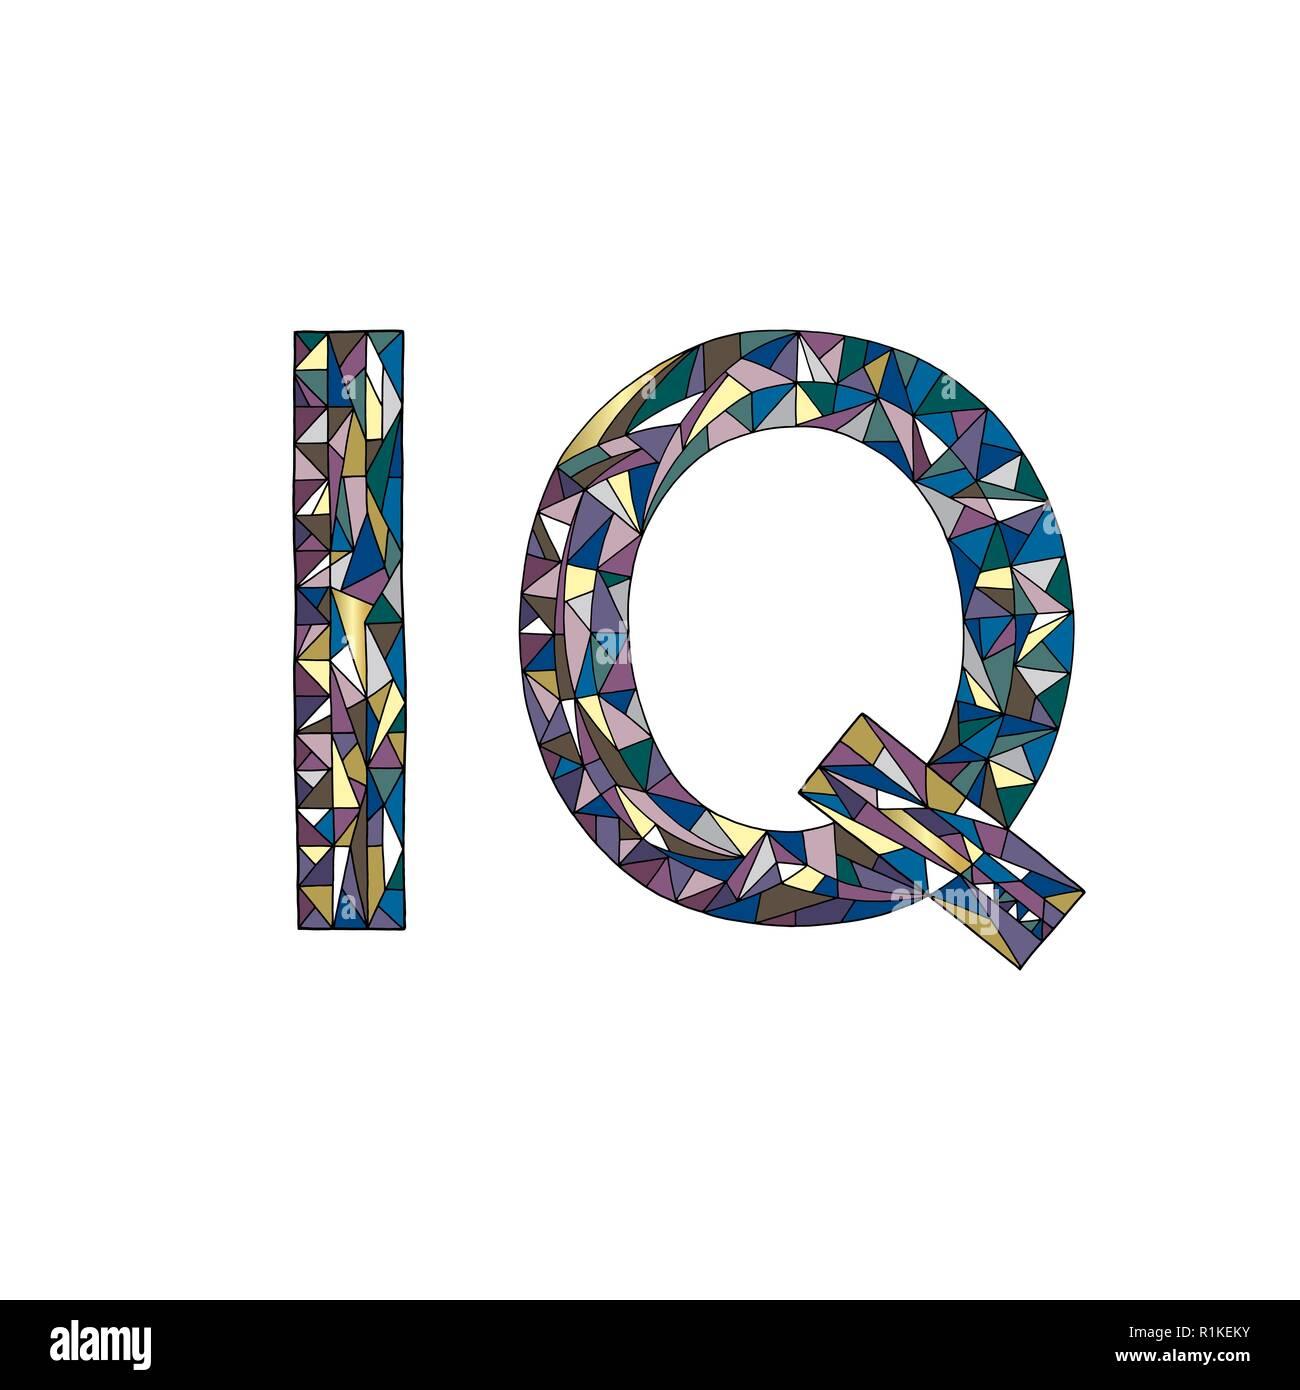 IQ hand drawn sign vector illustration. Intelligence quotient symbol - Stock Image